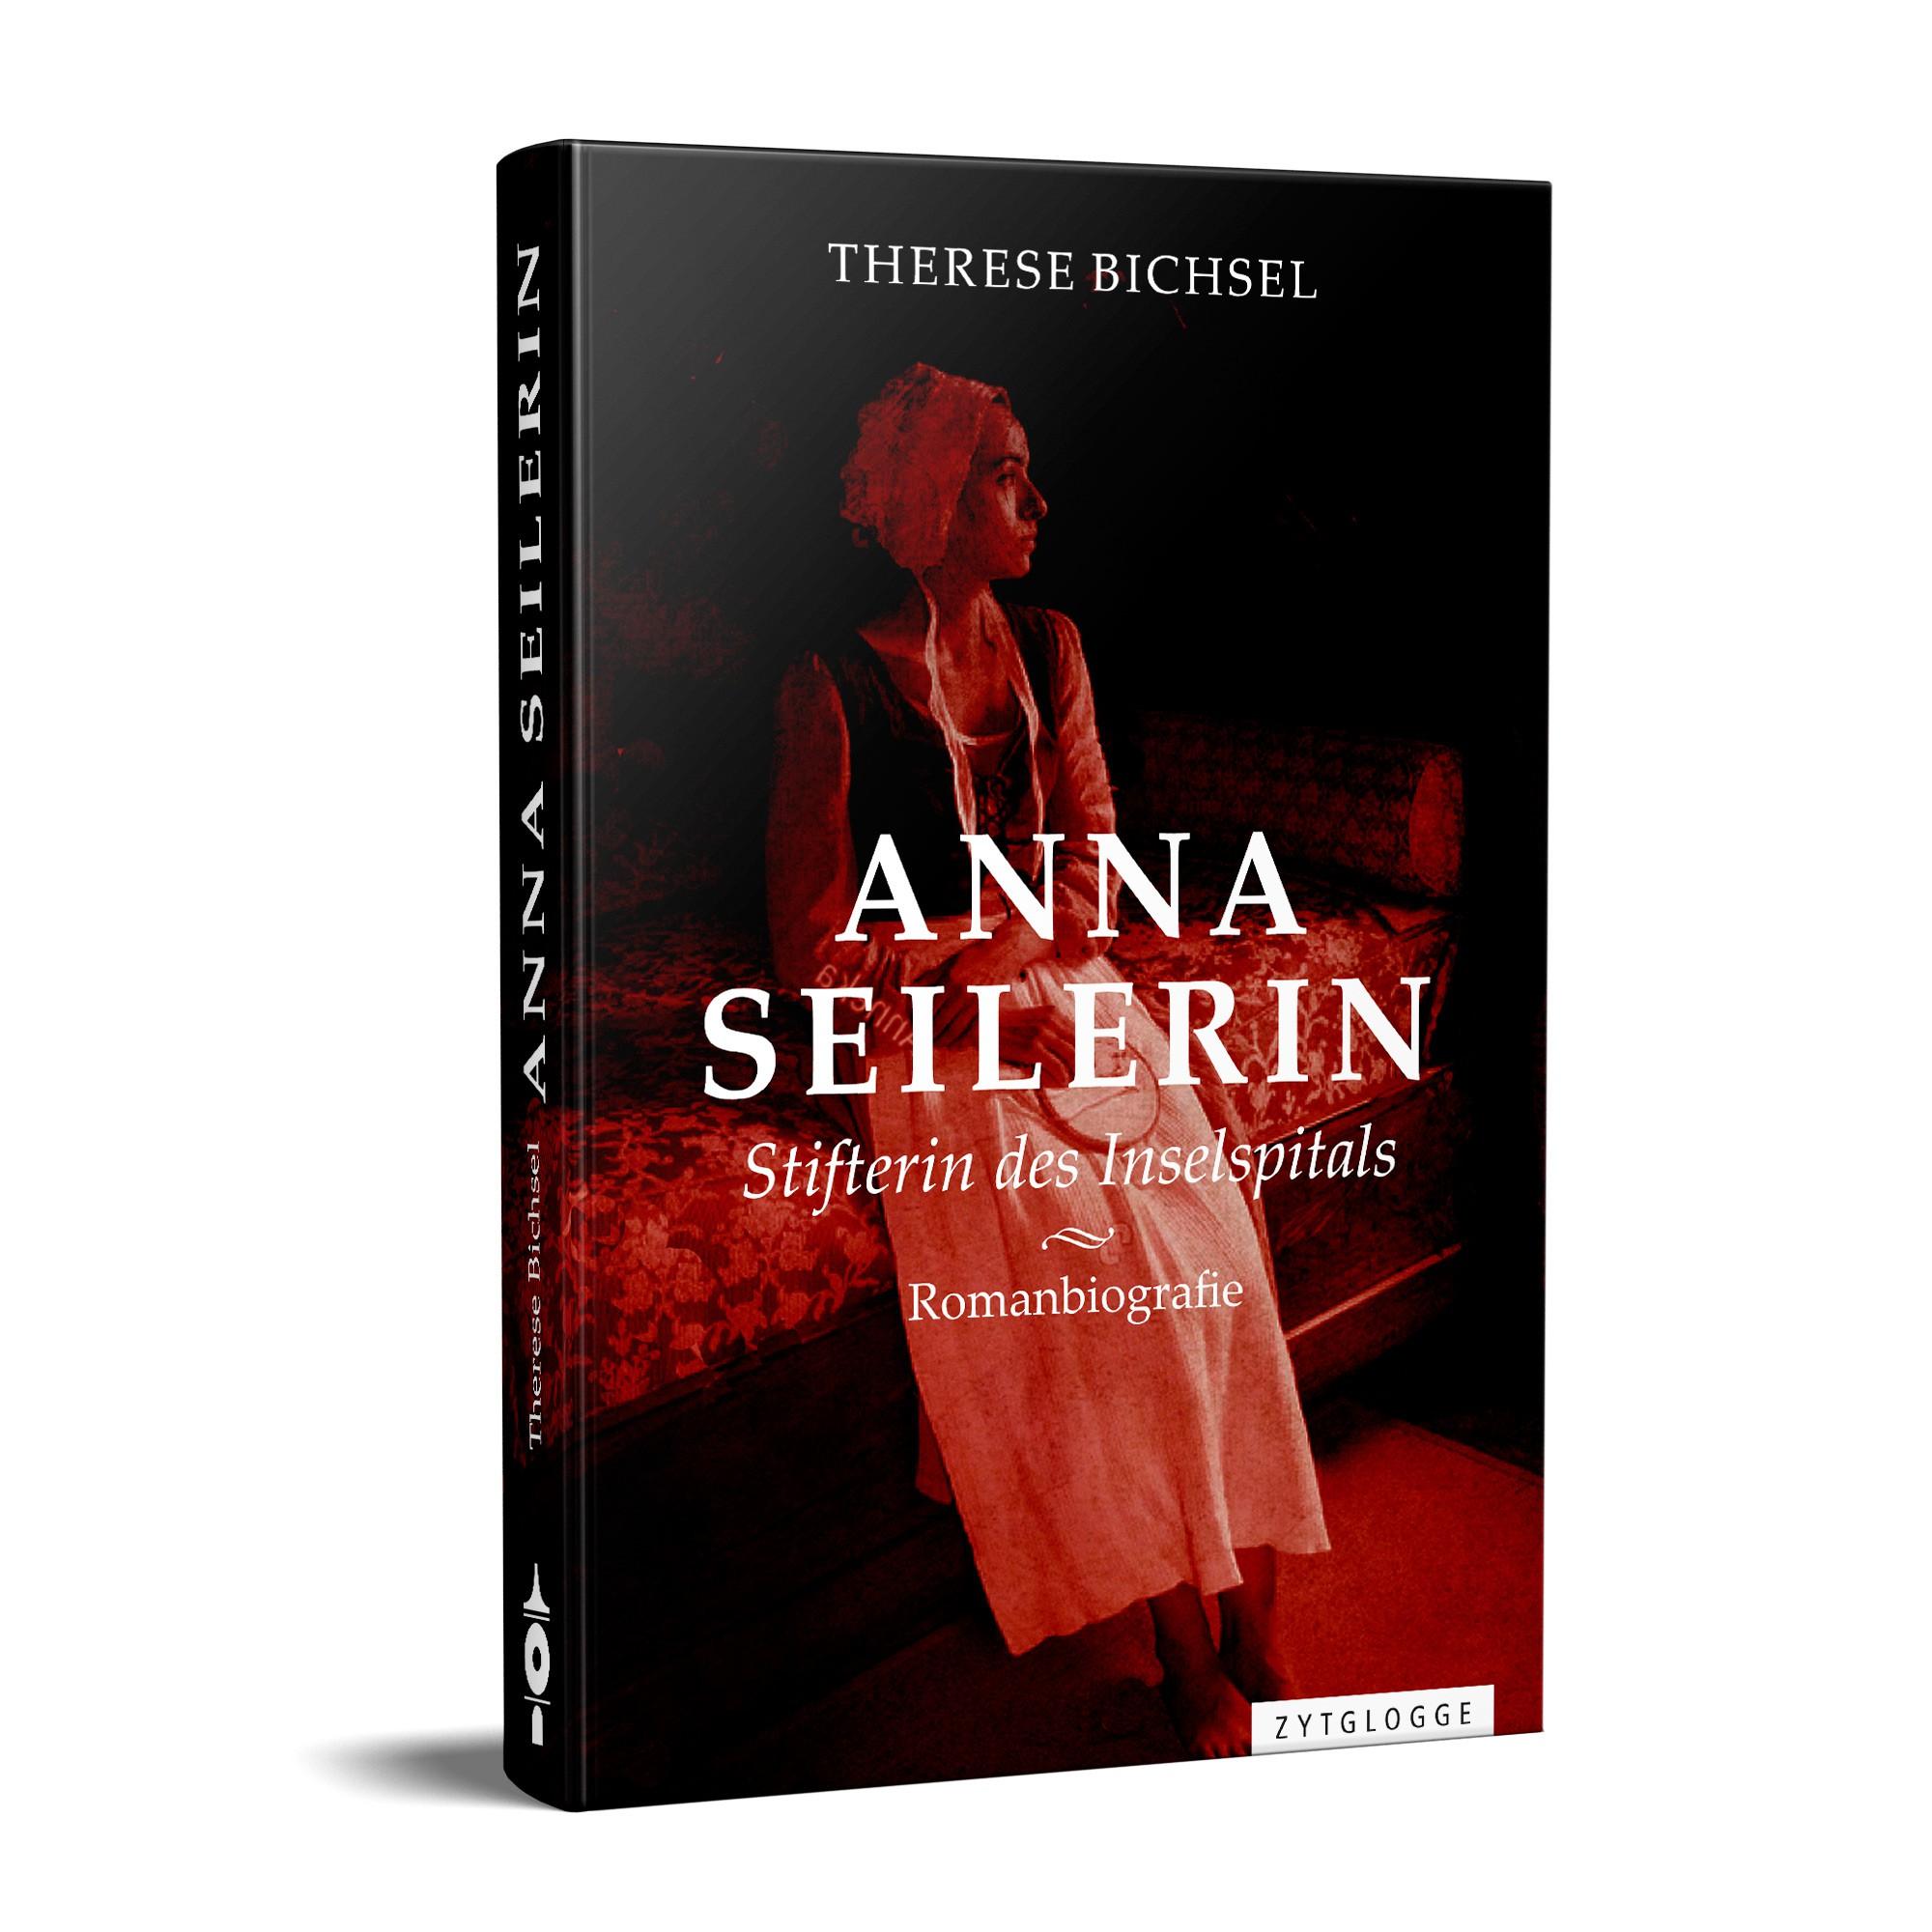 Atmospheric cover for historical novel/medieval biography